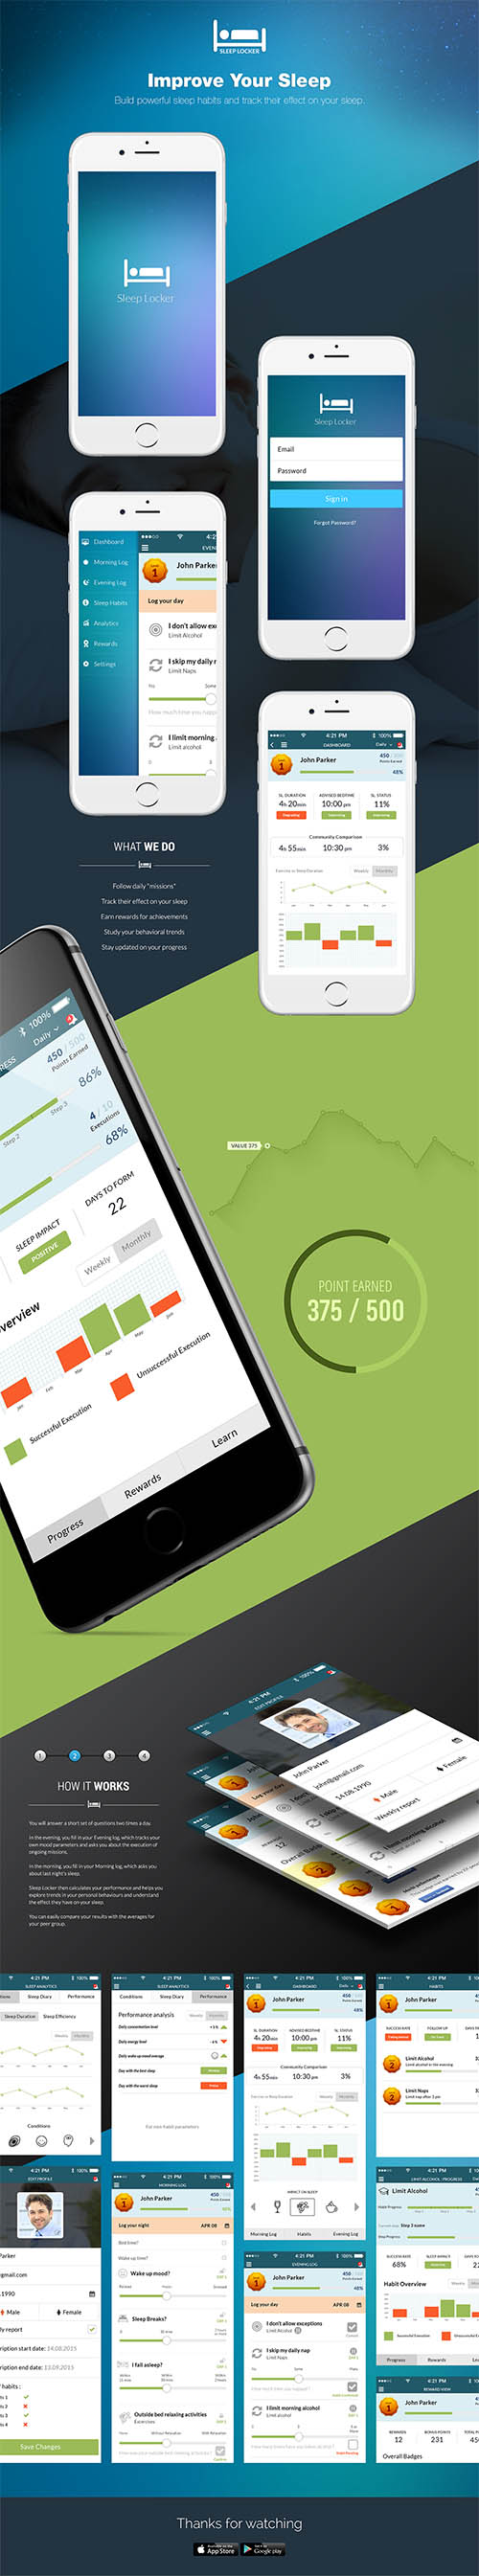 Sleep Tracking App By Chanchal Pramanik